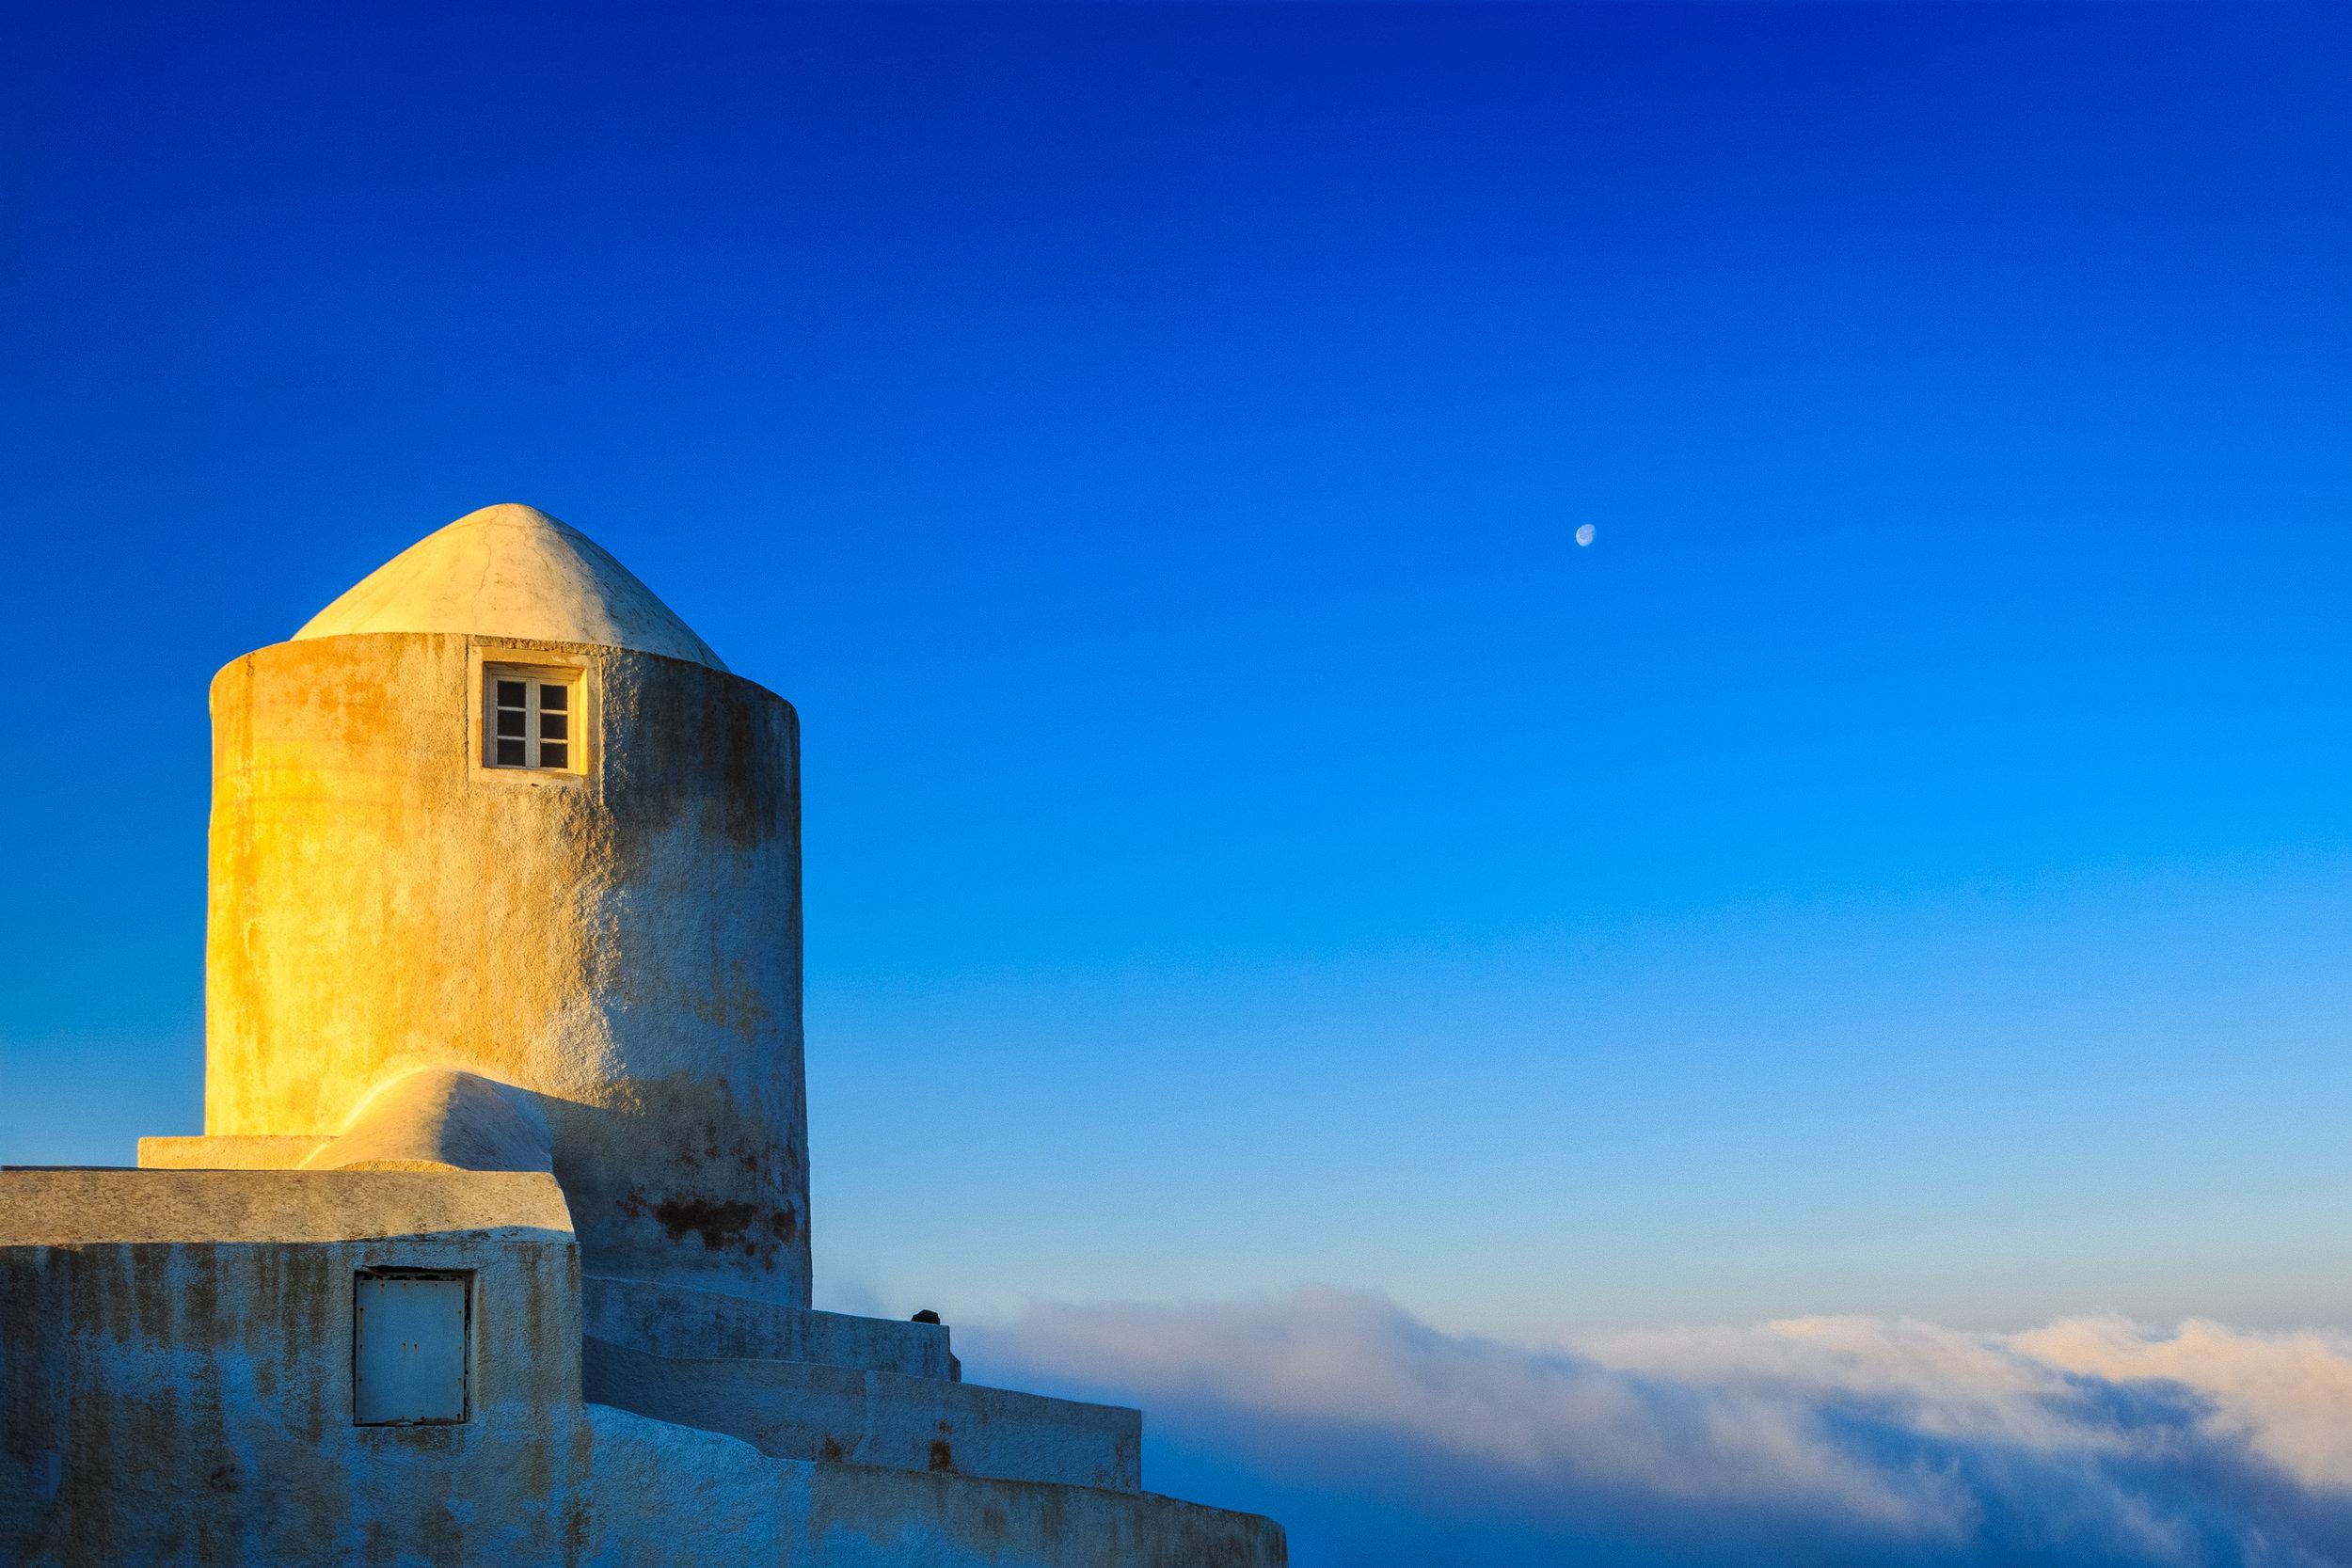 Photos of Santorini by Rick McEvoy - travel photographer